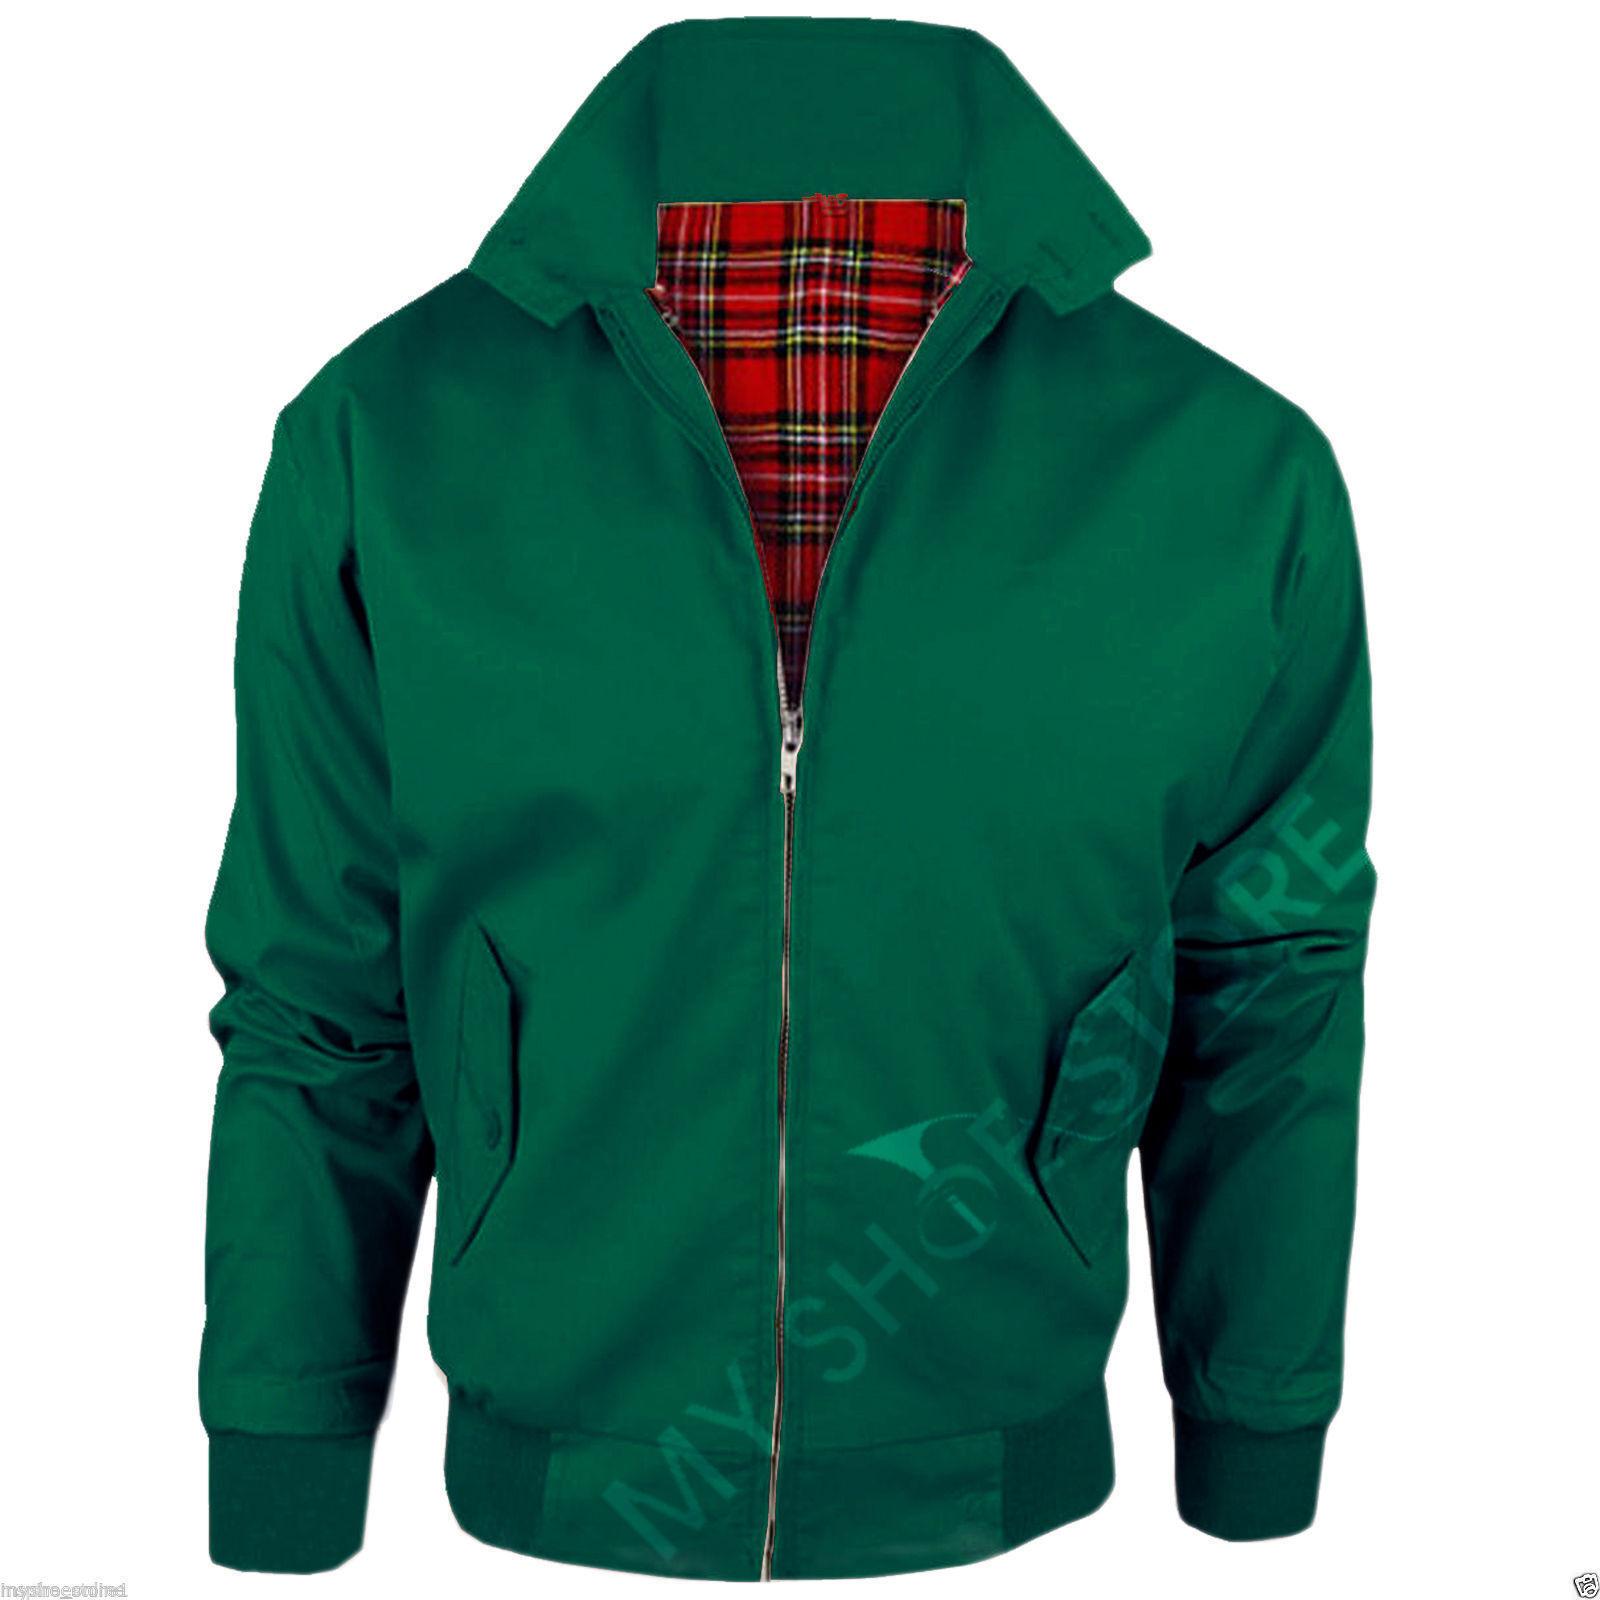 Green / Harrington Jacket Unisex Ladies Women